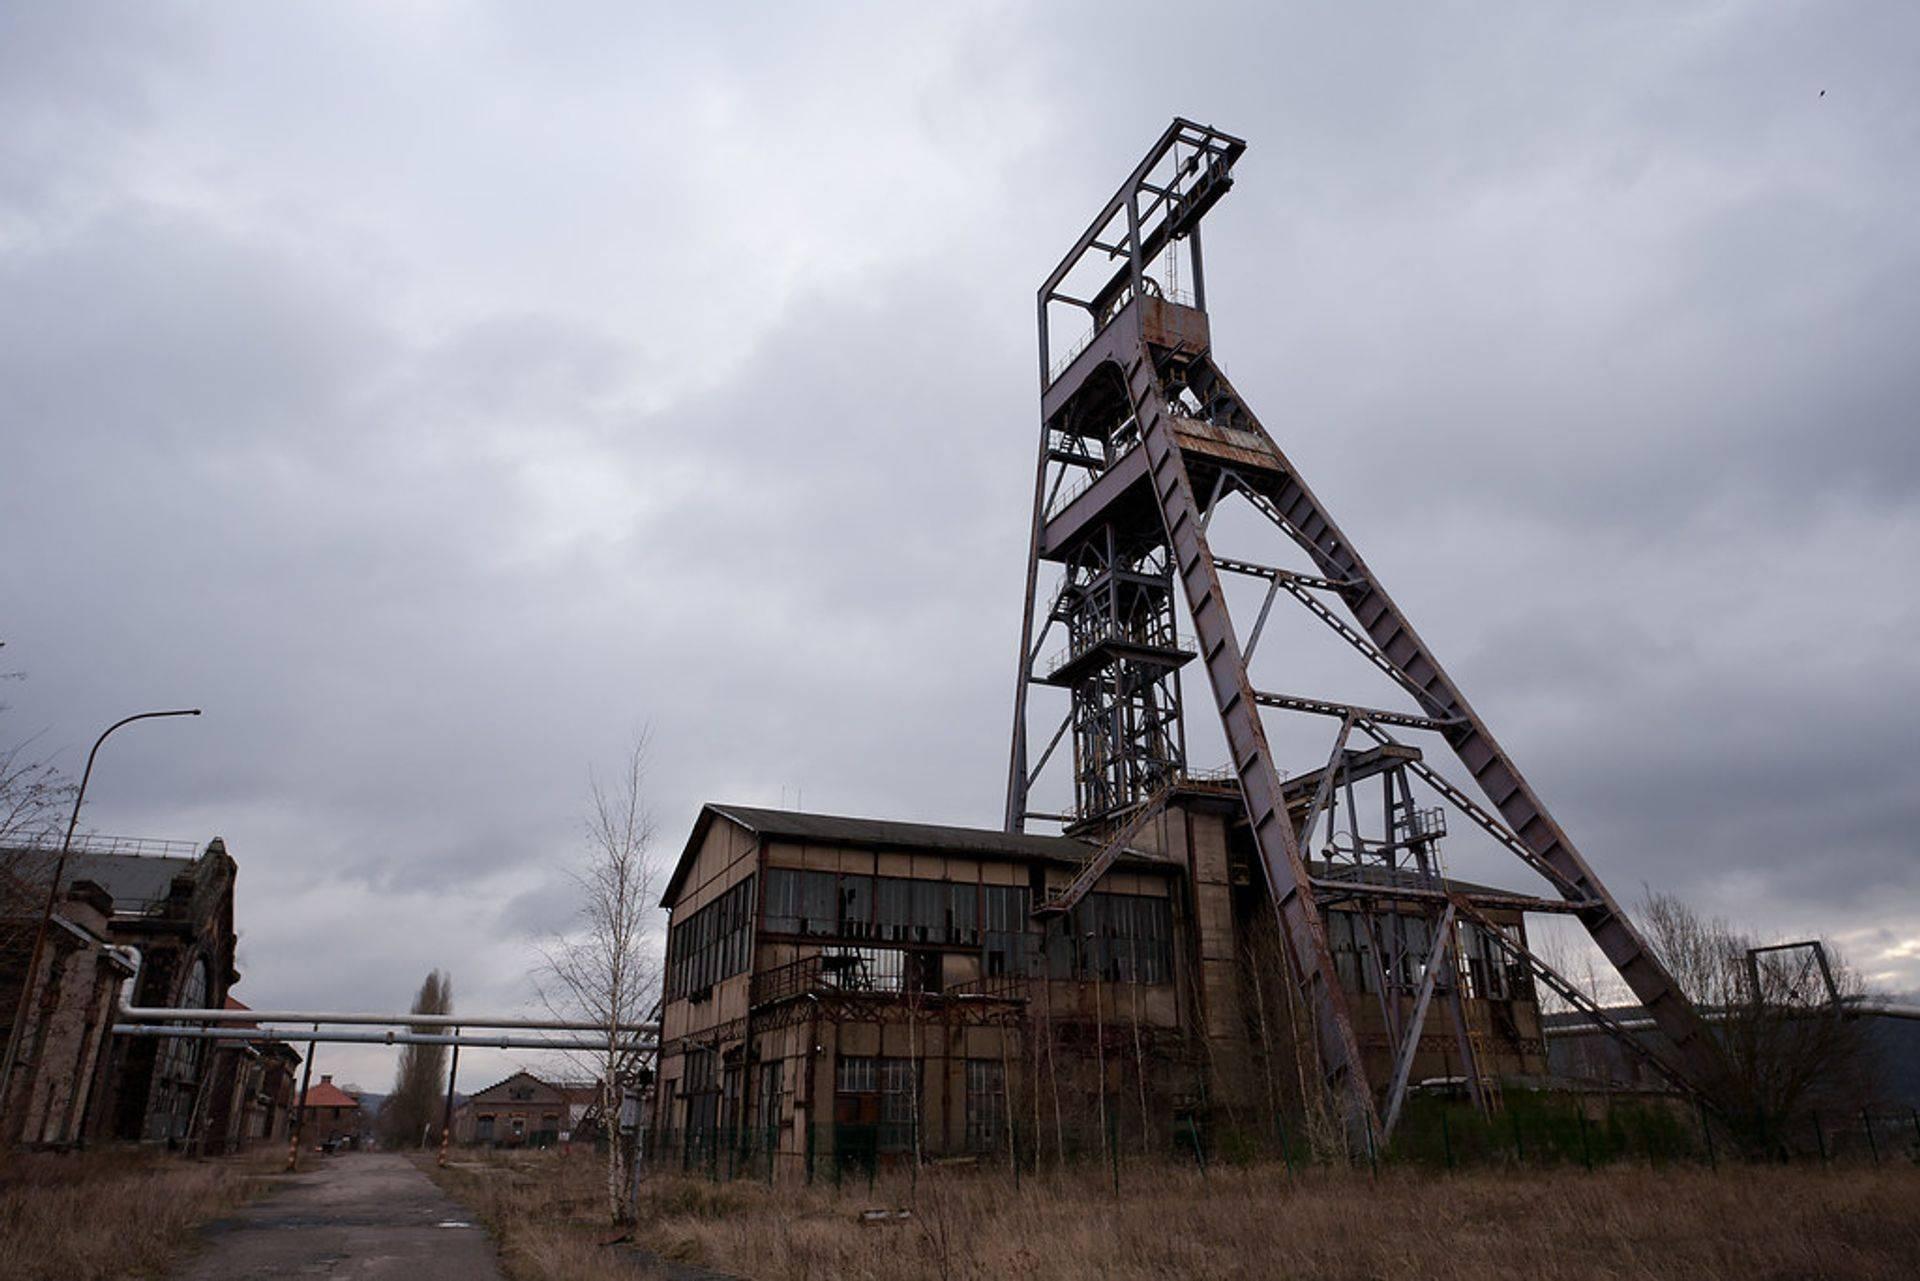 Colliery Coal Mining